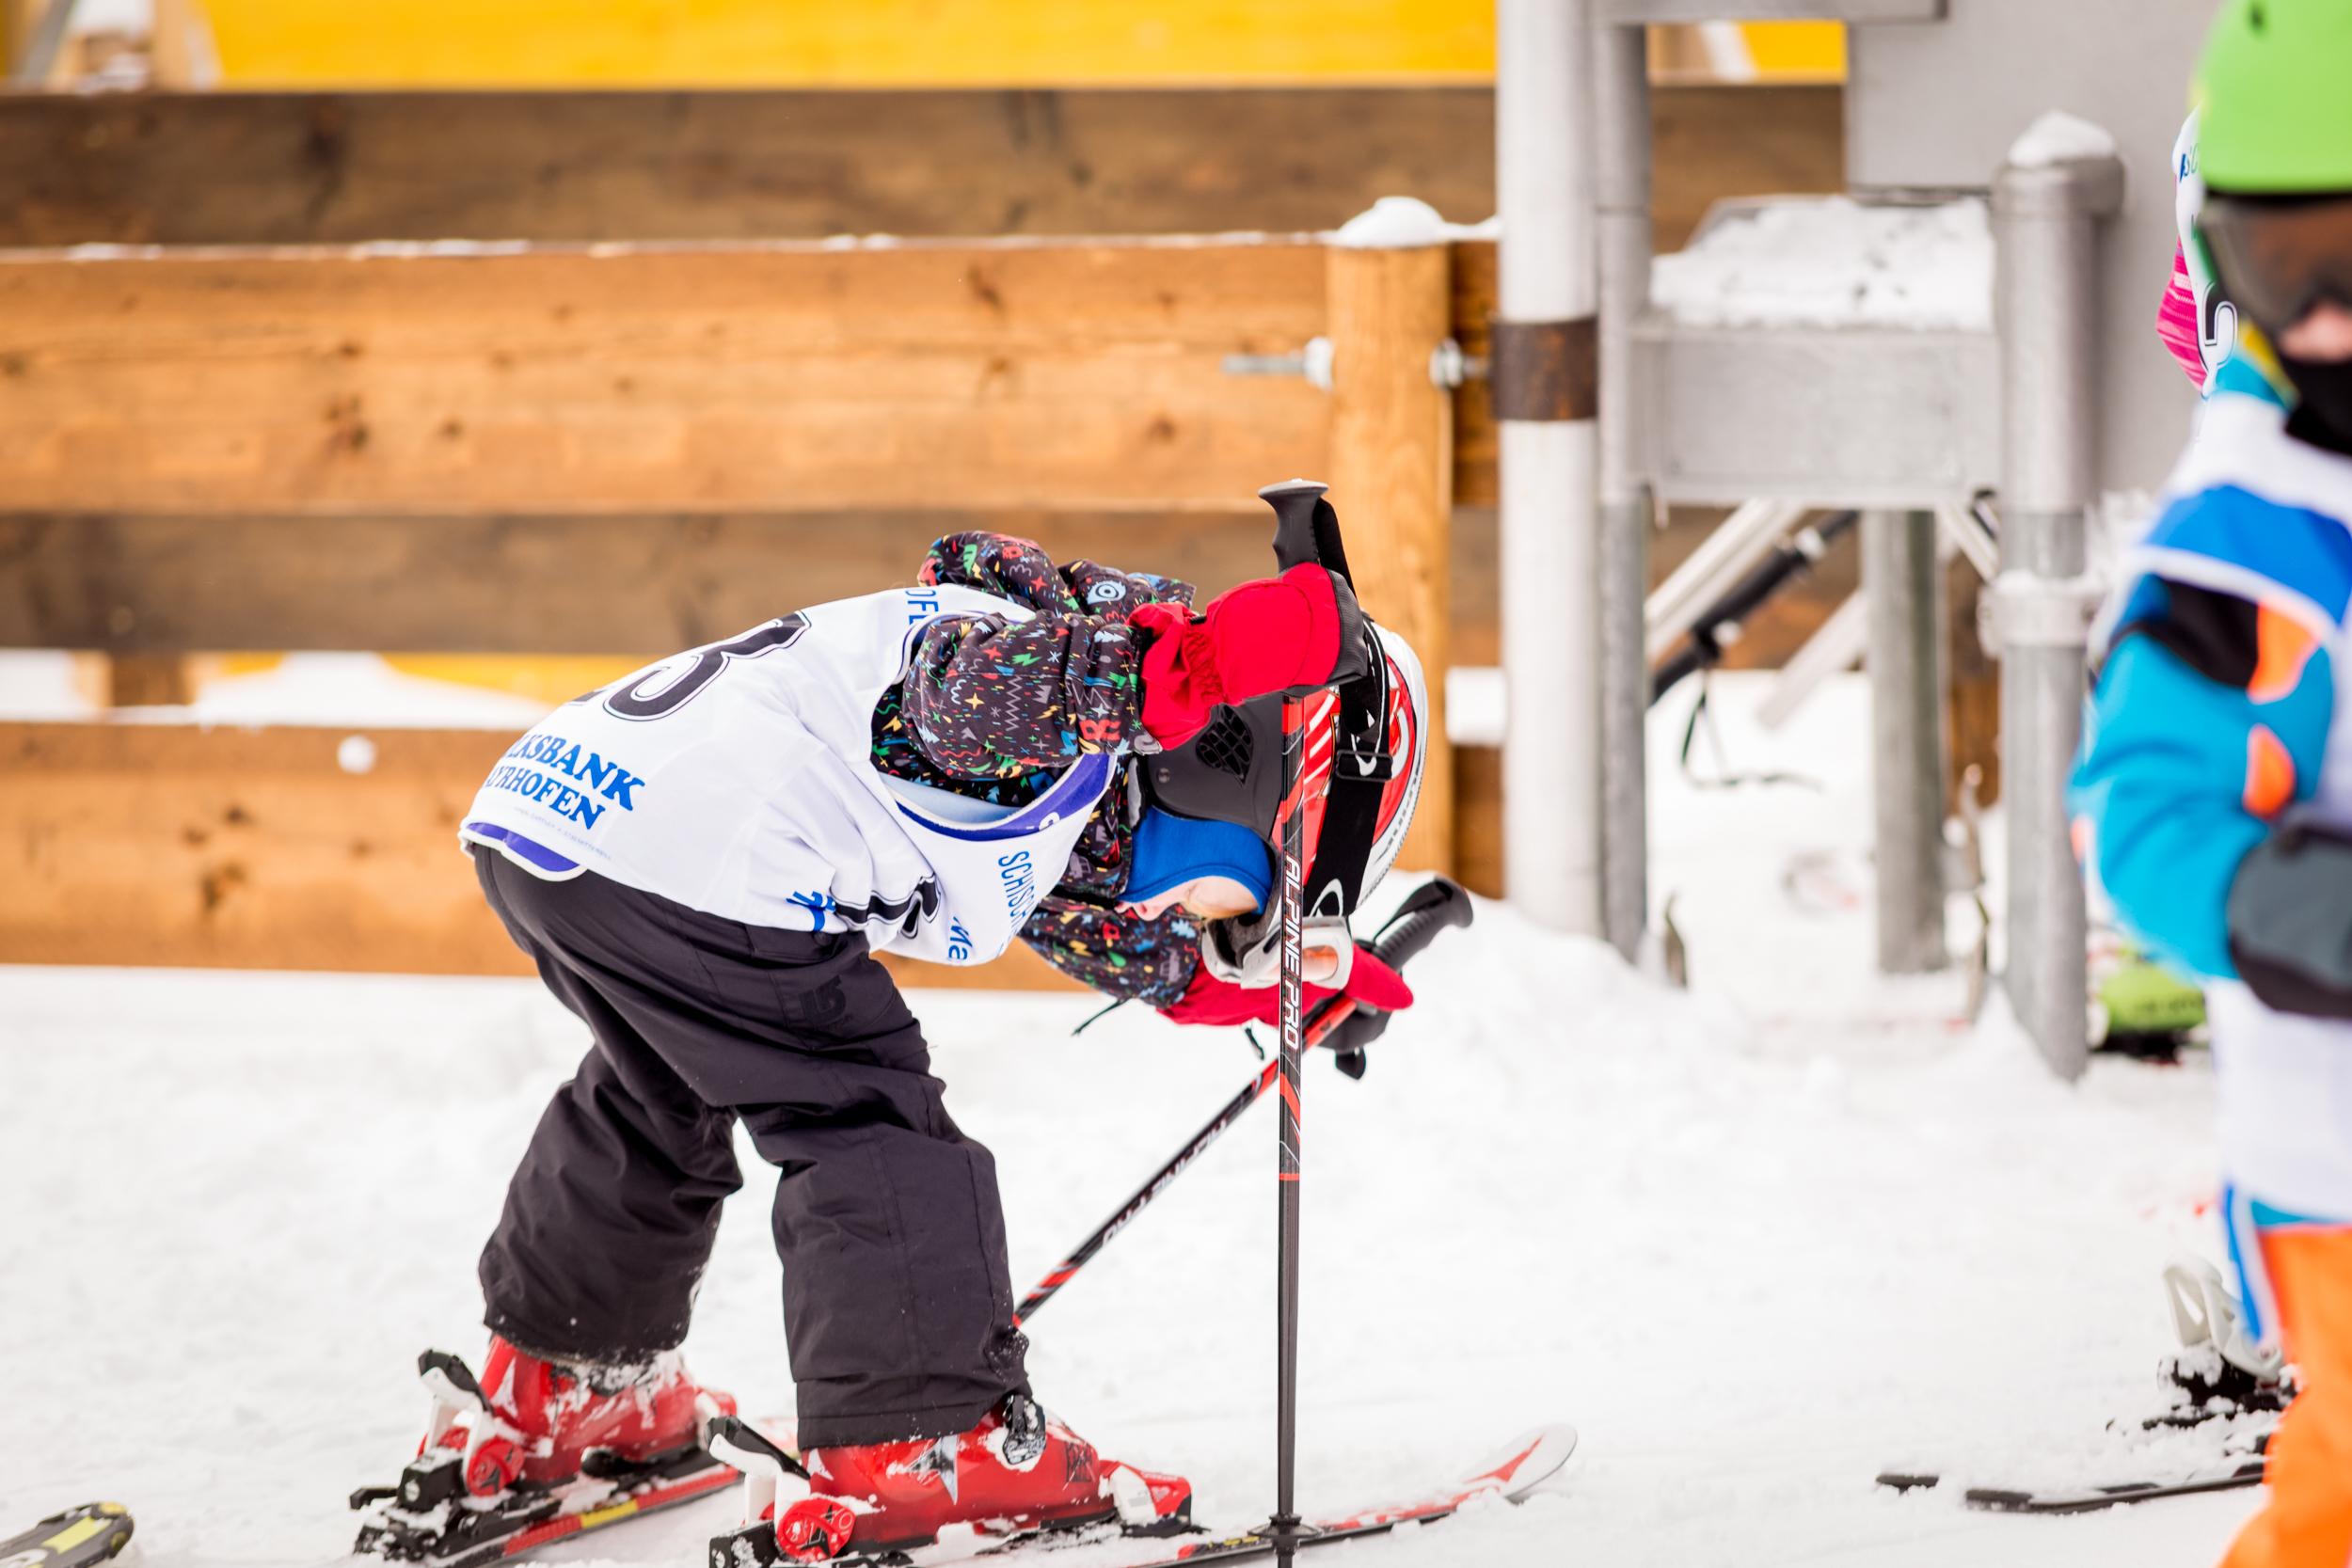 ski race 16_0001.jpg